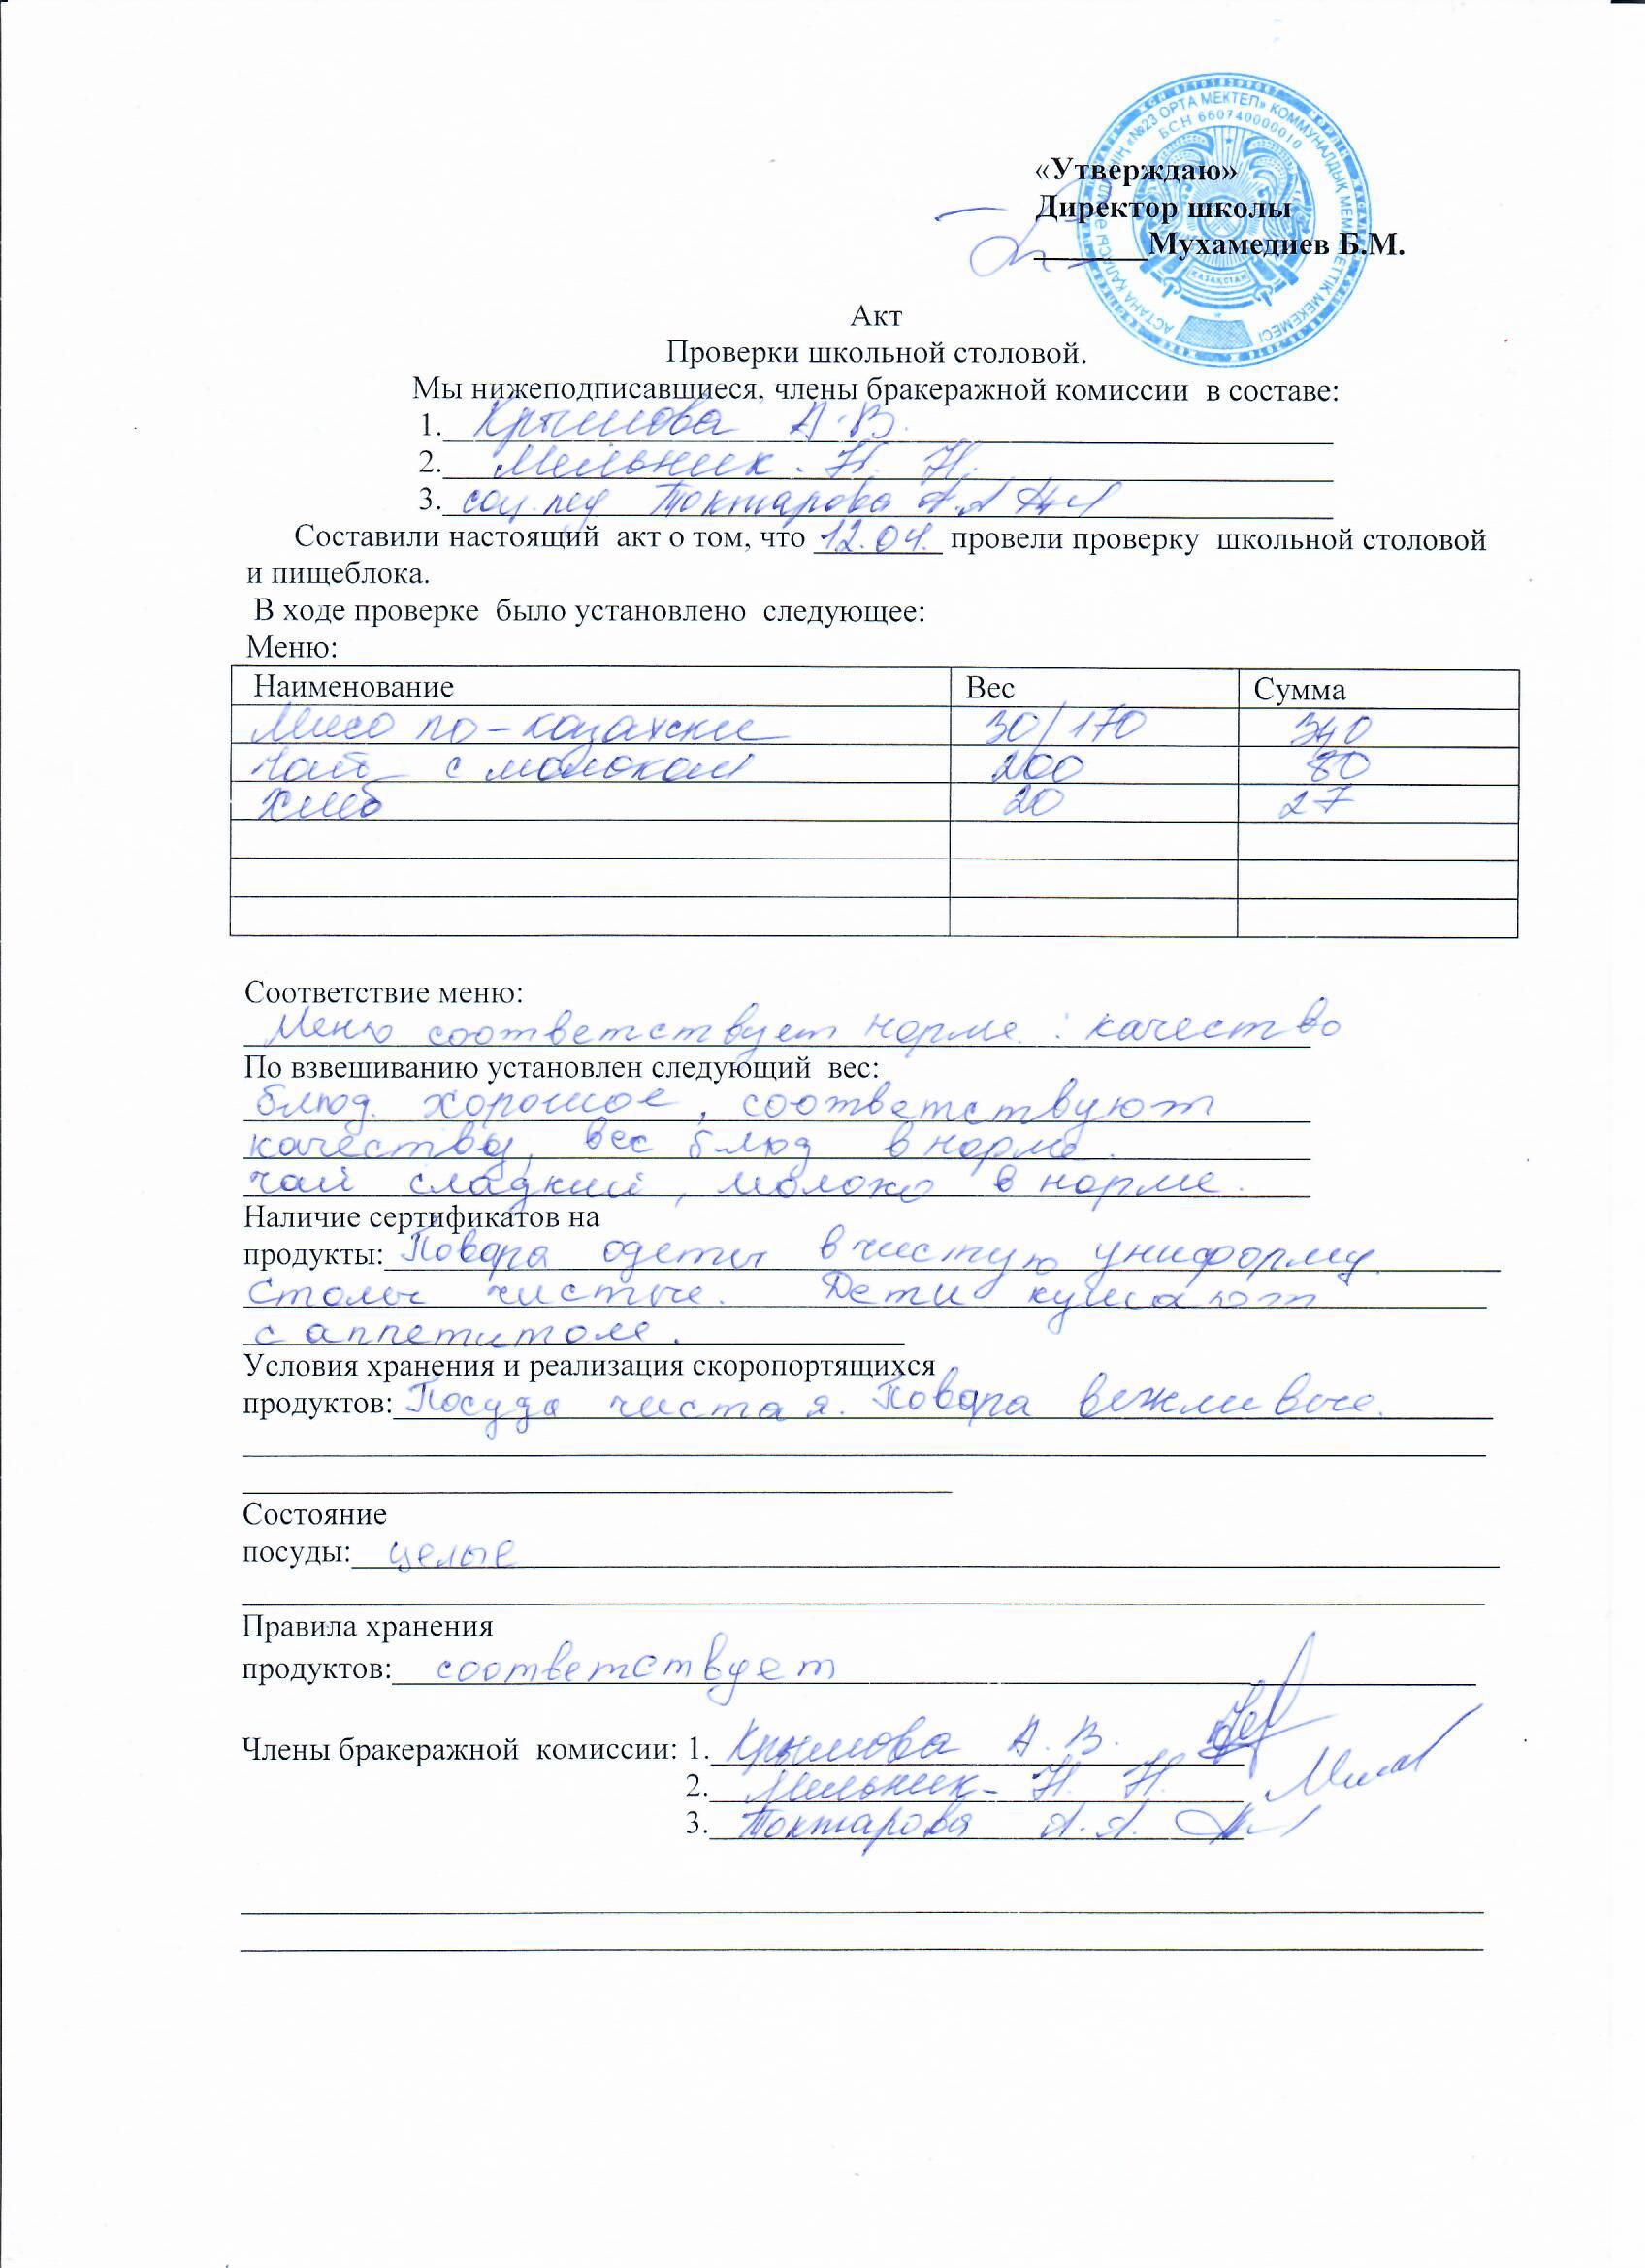 http://23.astana-bilim.kz/files/sites/1383501240817982/files/Pitanie%201/Скан_20190415.jpg